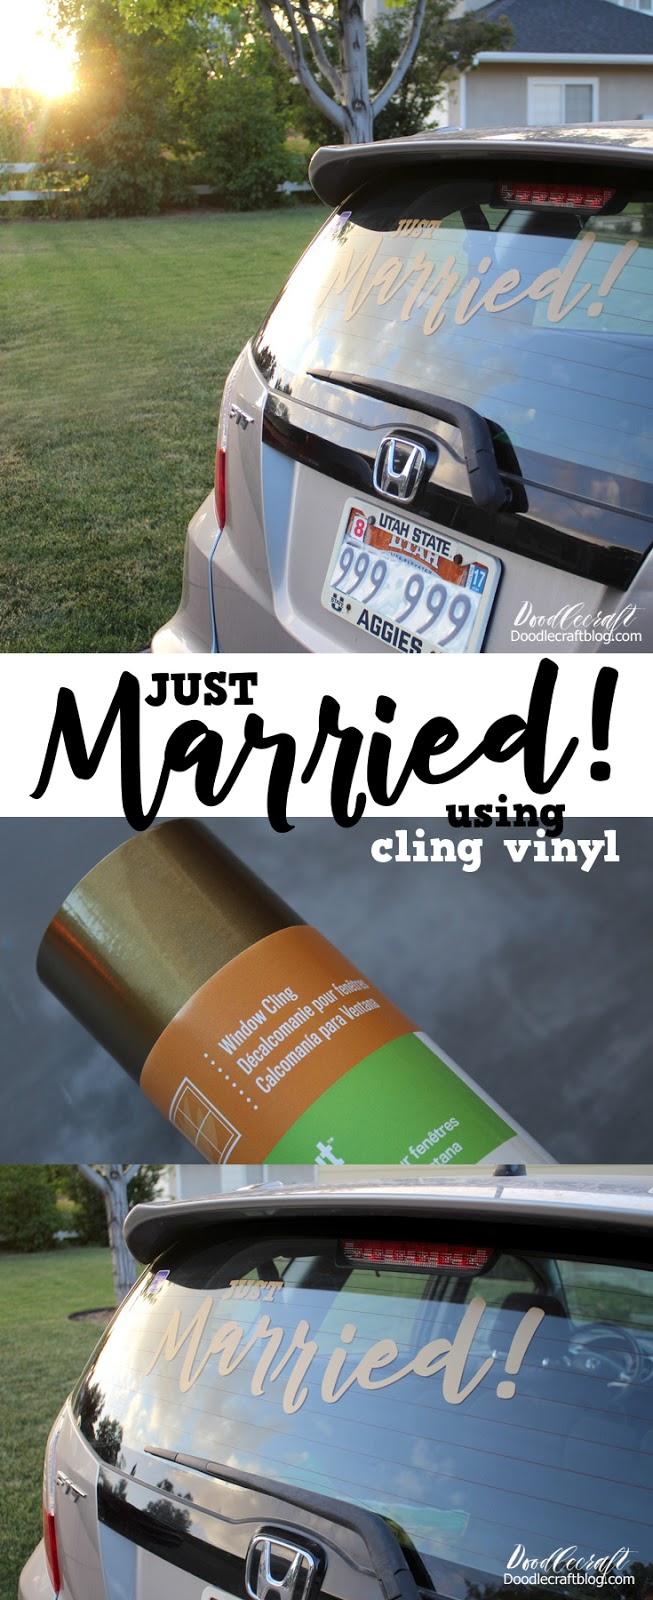 Doodlecraft Cricut Explore Air 2 Just Married Cling Vinyl